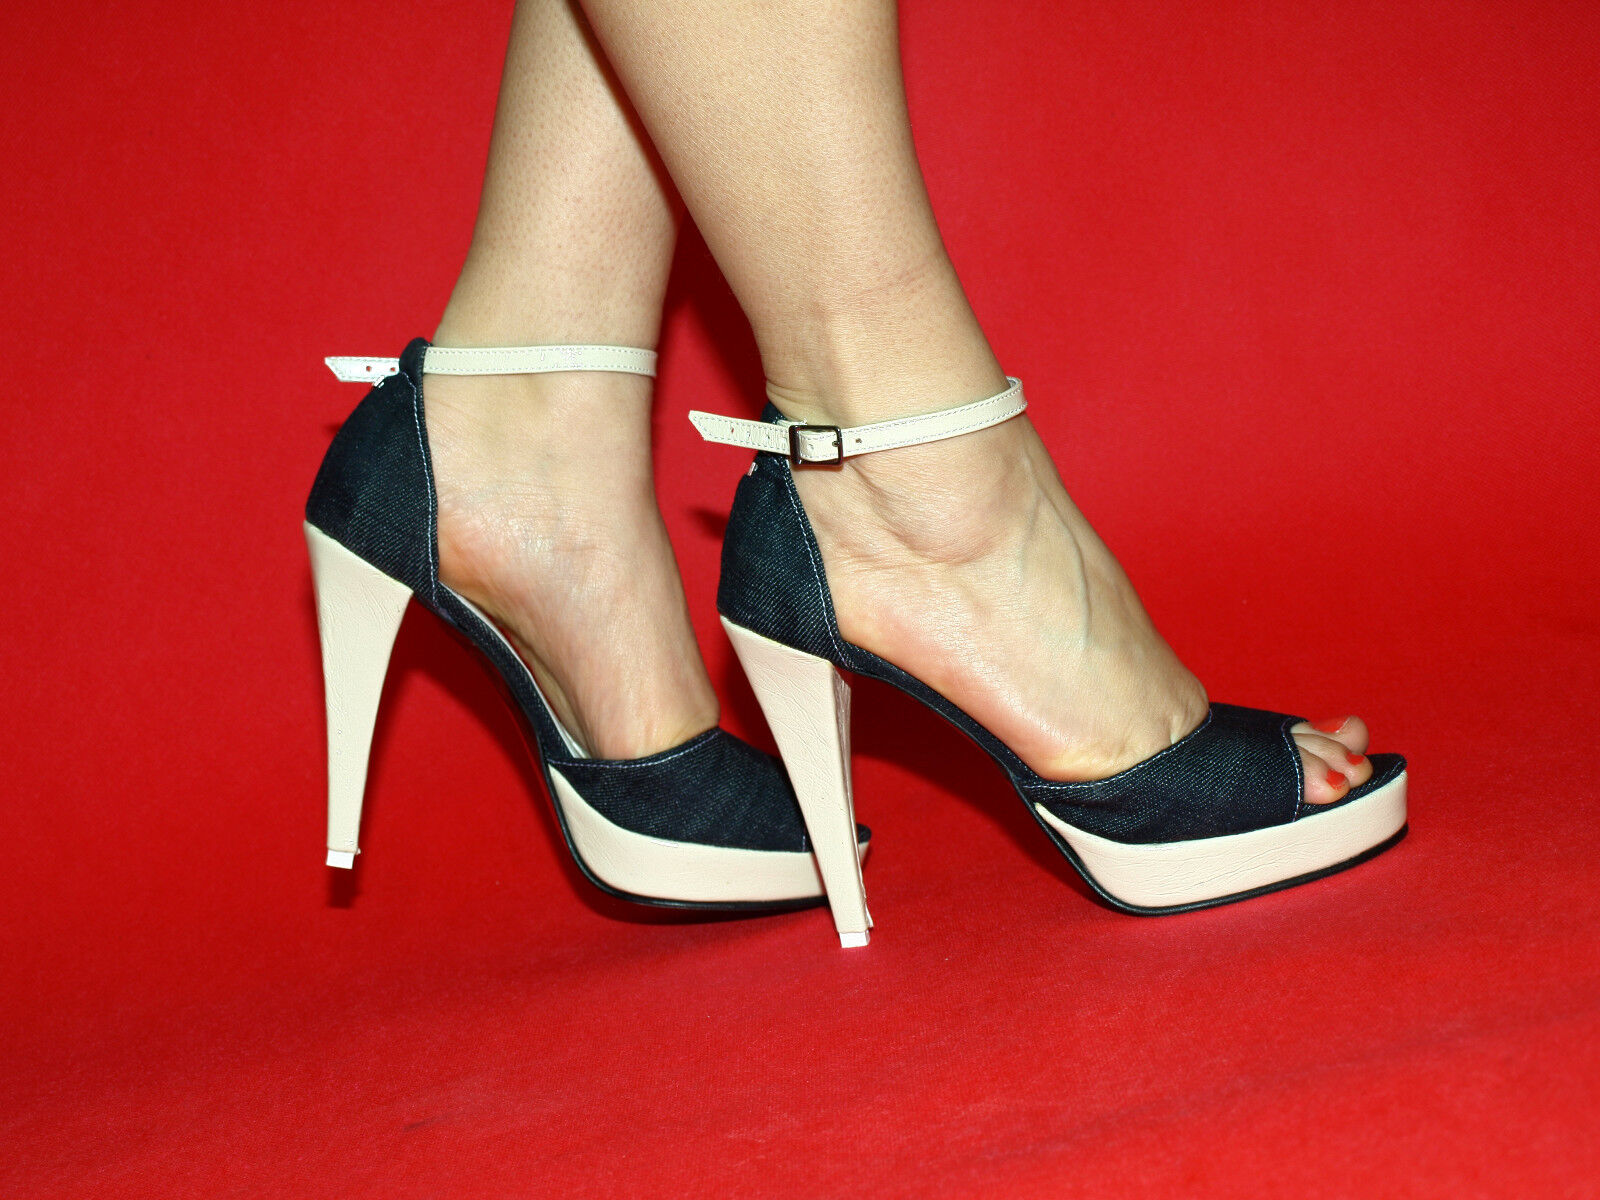 Pumps  37 38 39 40 41 42 43 44 45 46 47 Bolingier-Poland heels 13cm FS1313